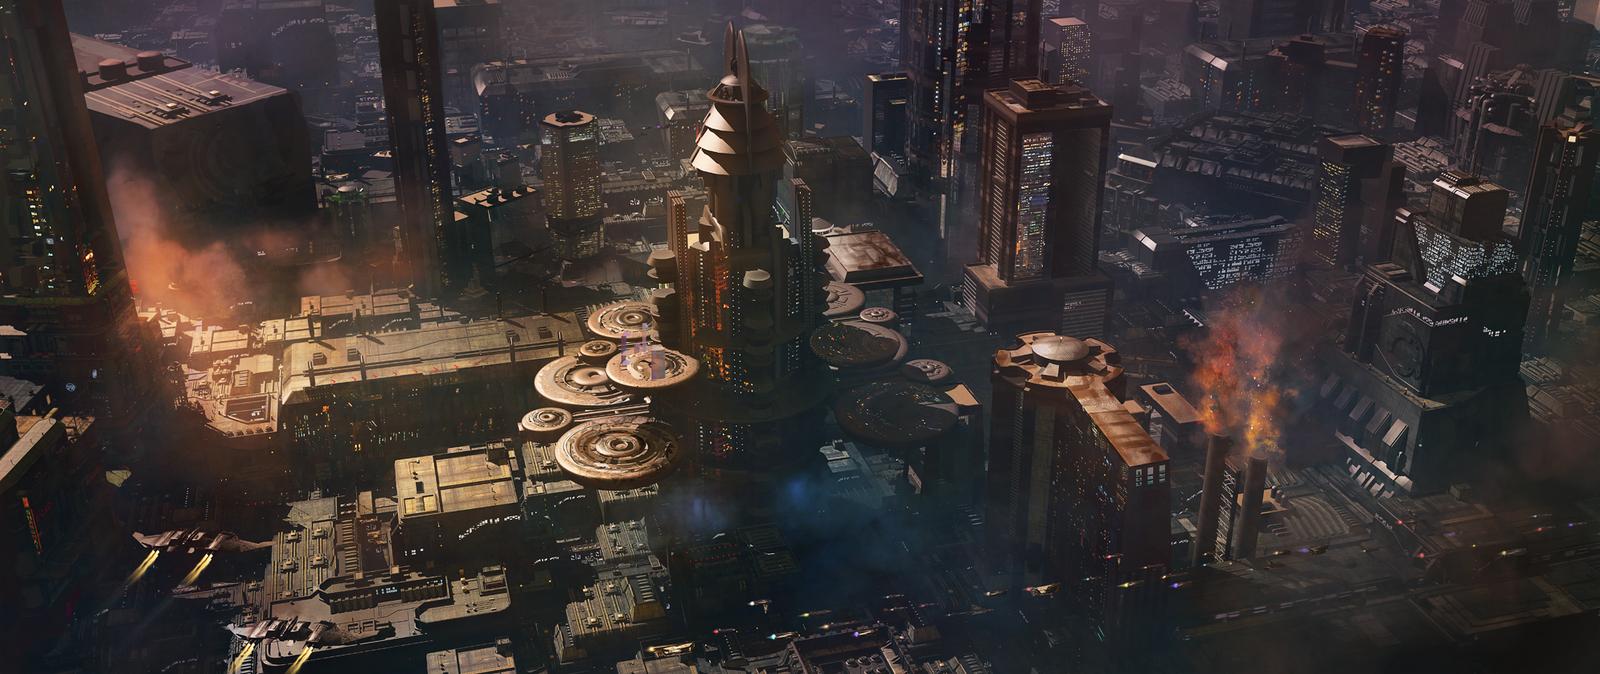 ... art scenes futuristic sci fi 2012 2015 fmacmanus aurora rising i m